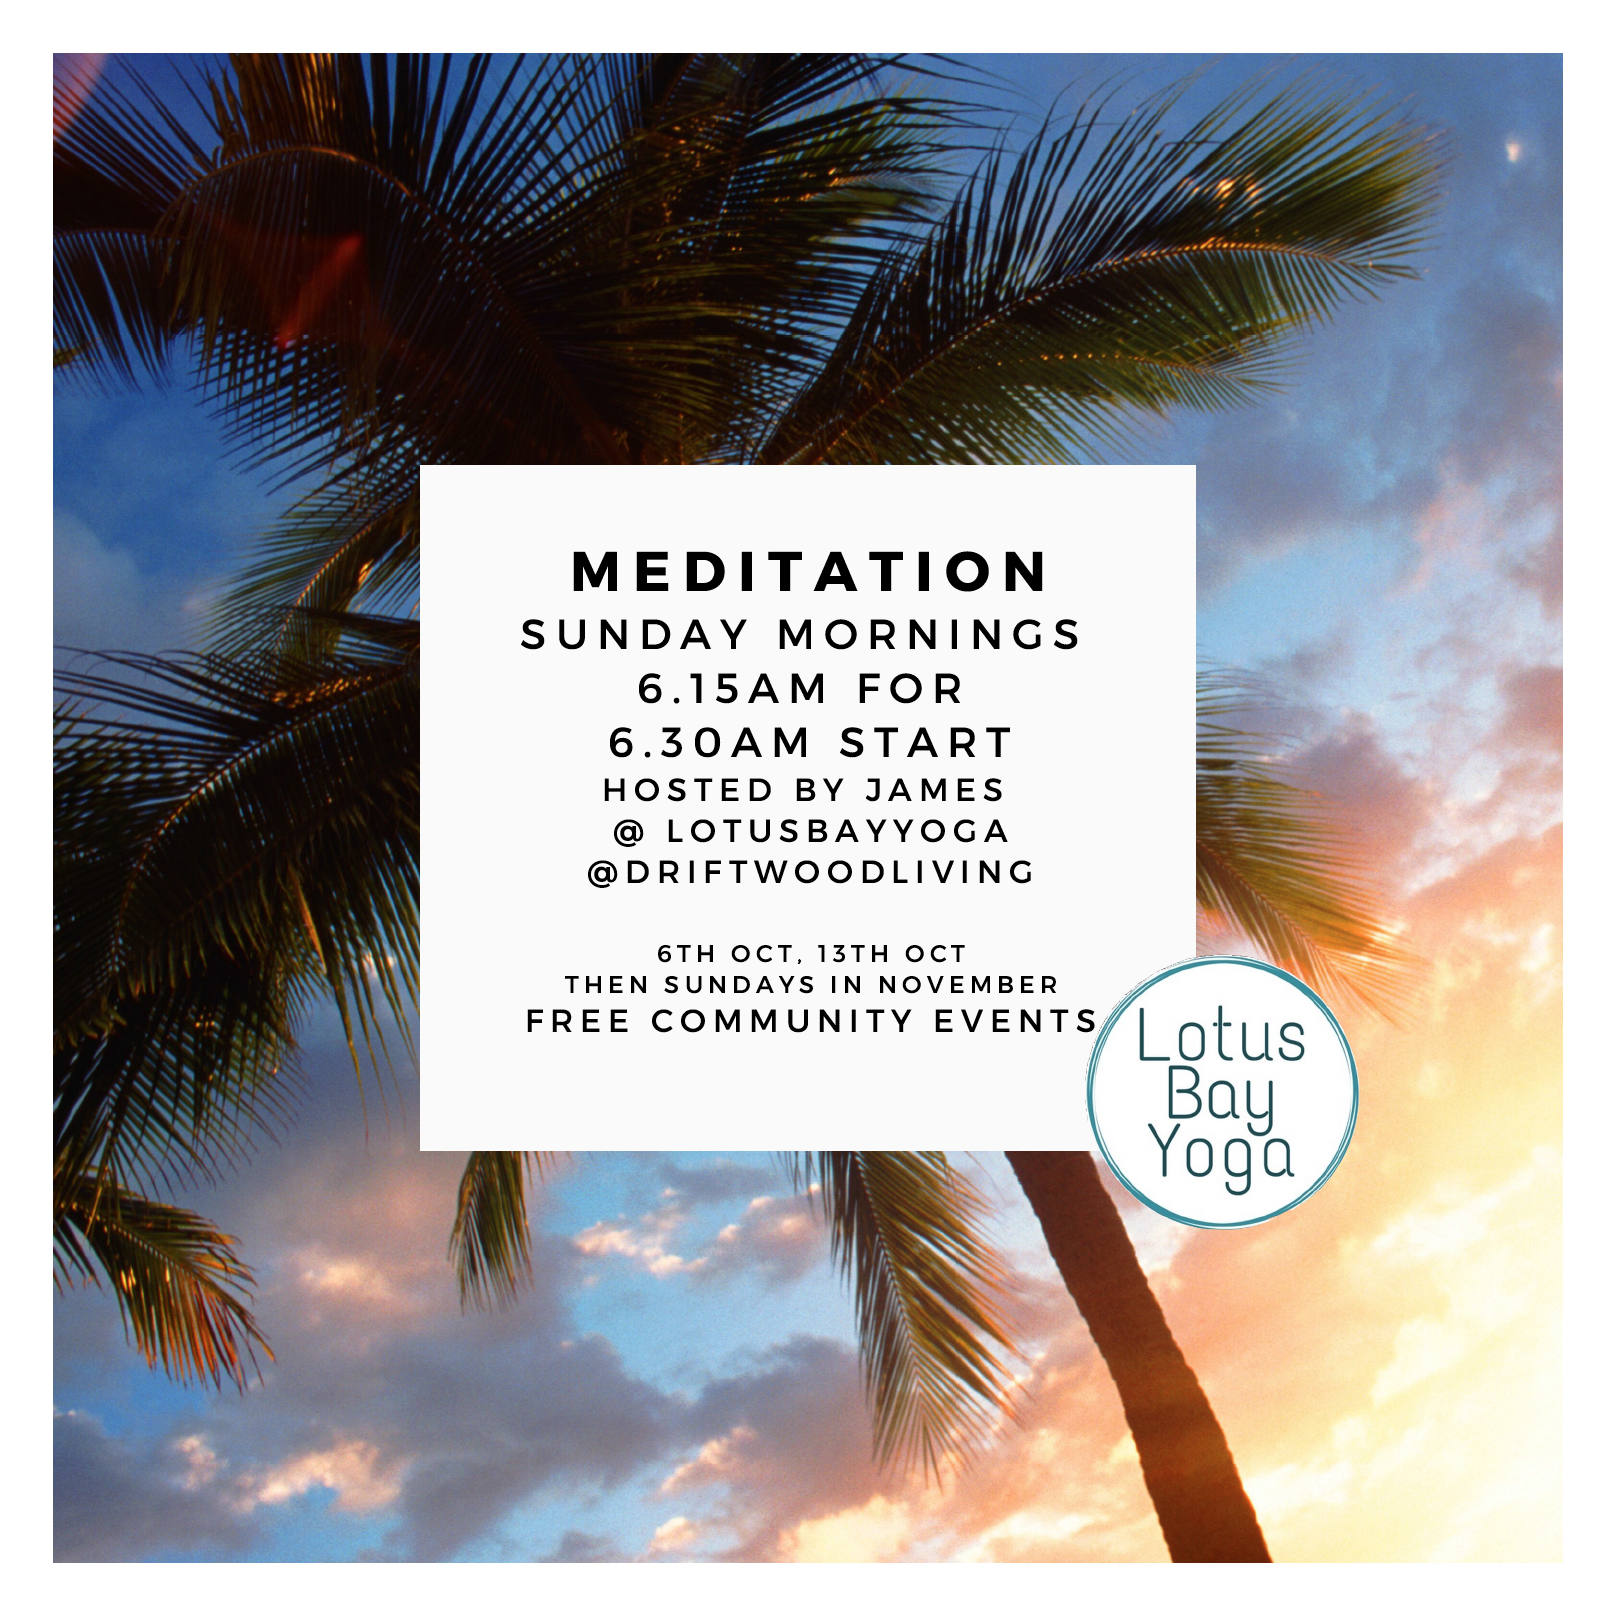 Sunday Morning Meditation Free Community Event.jpg